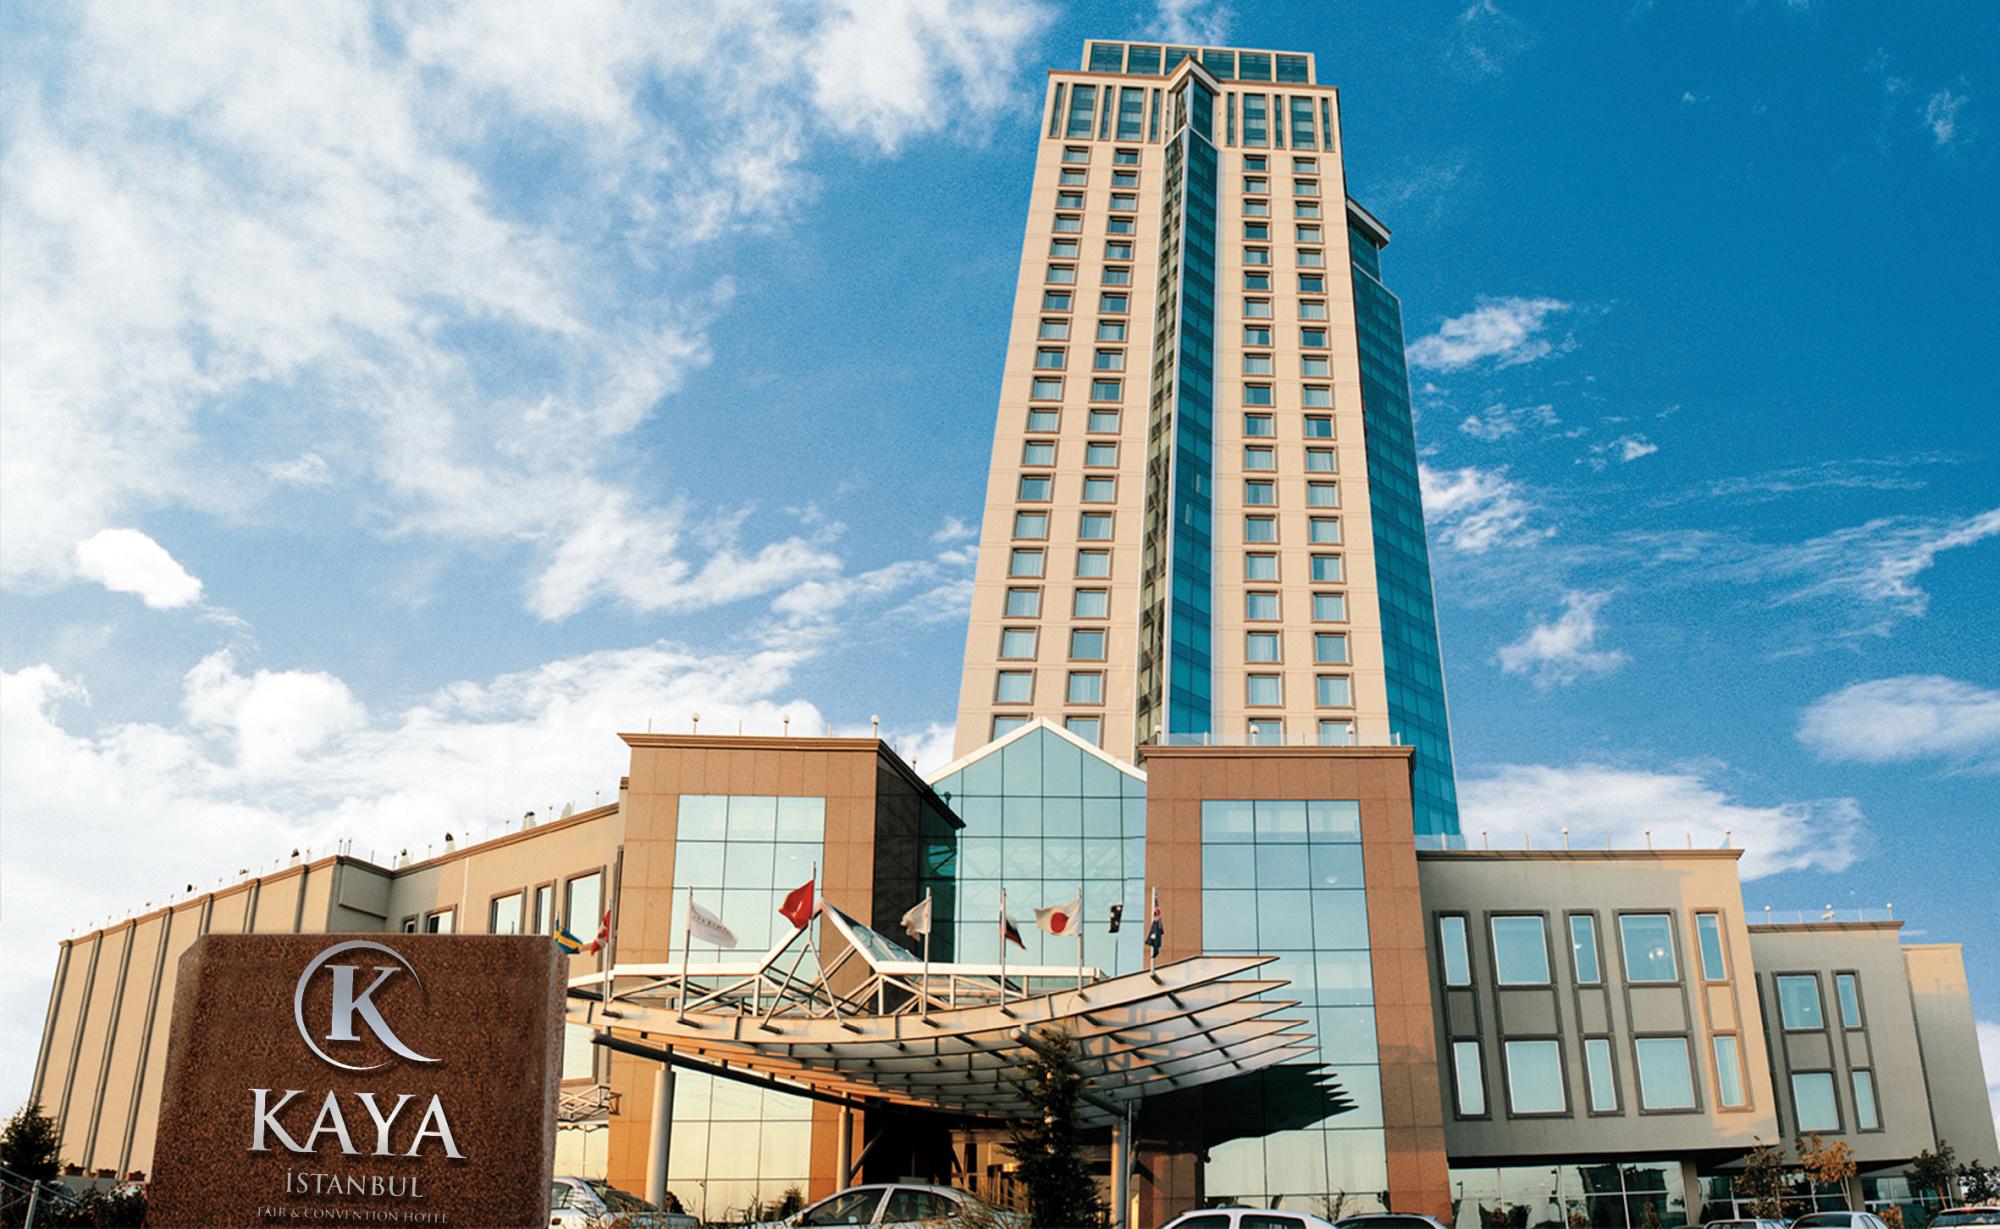 Kaya İstanbul Fair & Convention